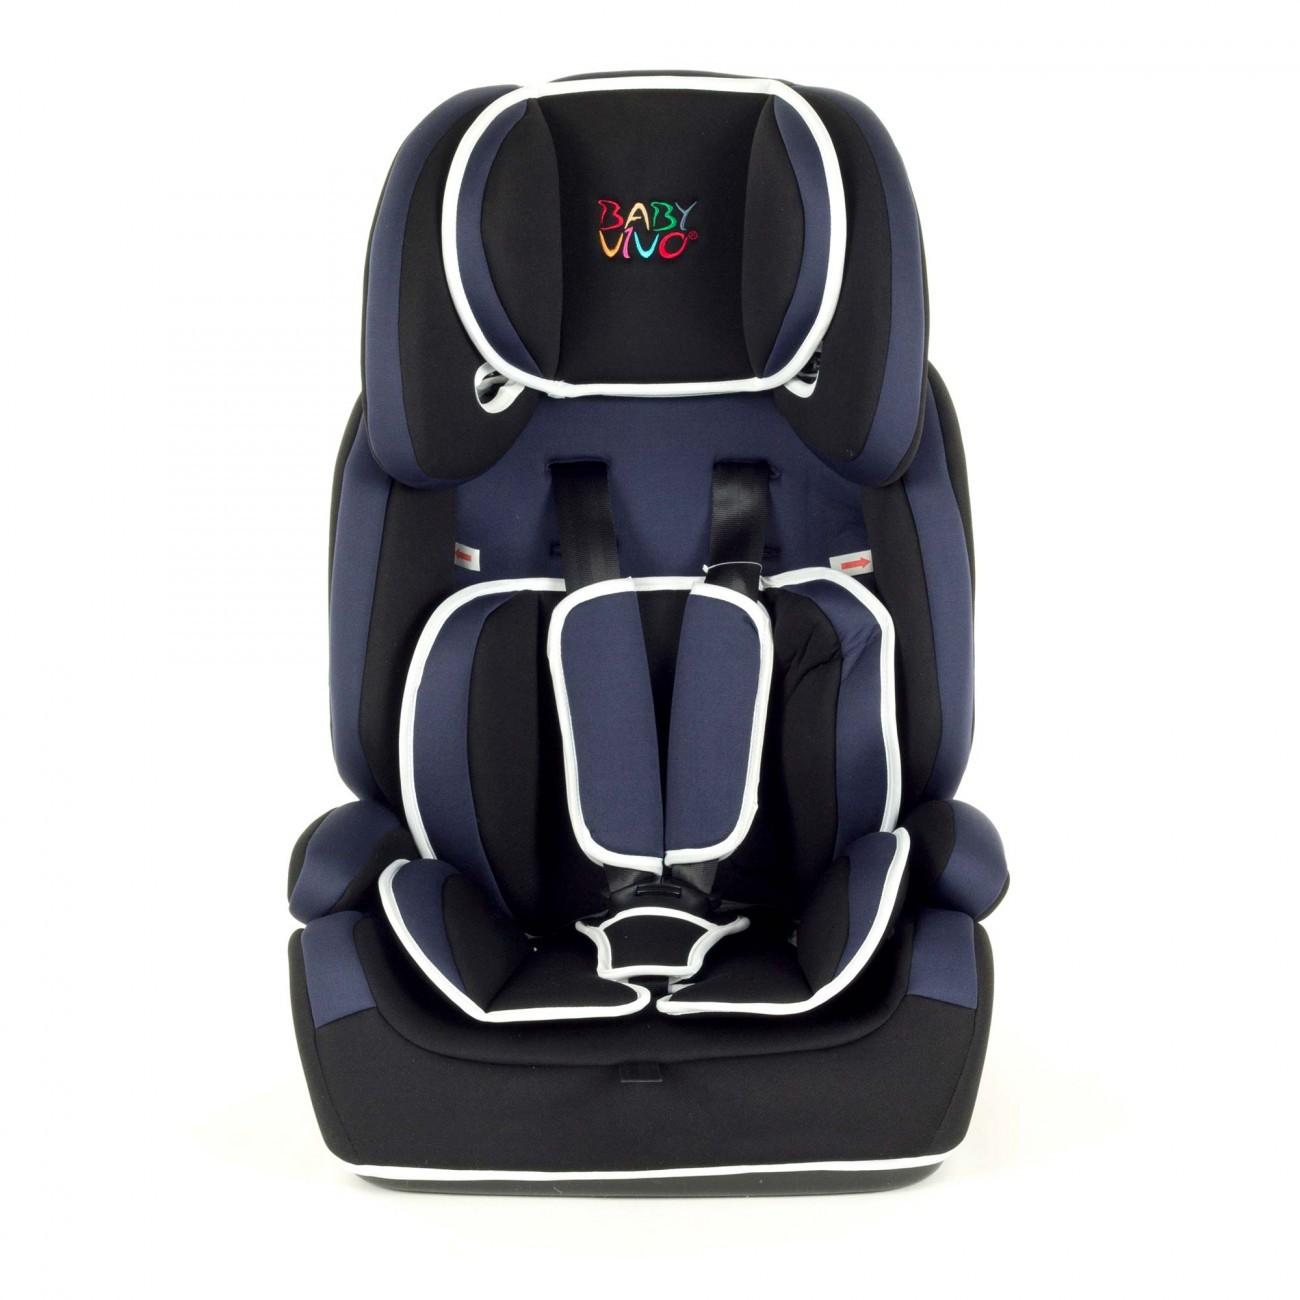 b ware autokindersitz kinderautositz autositz kindersitz 9. Black Bedroom Furniture Sets. Home Design Ideas